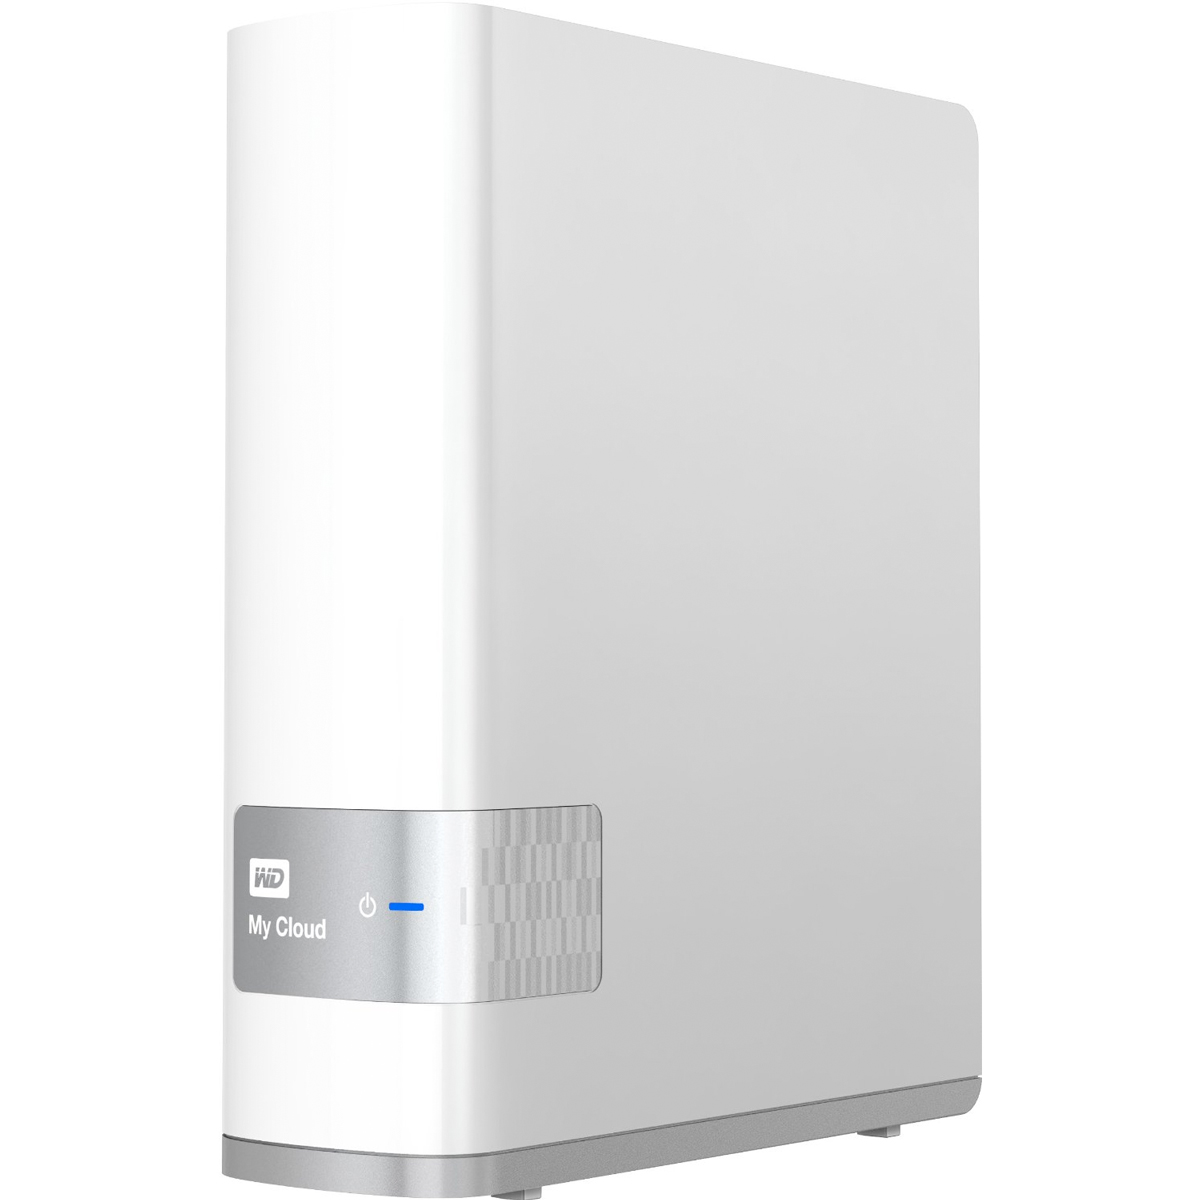 WD MyCloud, disco per cloud personale da 2 TB a solo 129 euro